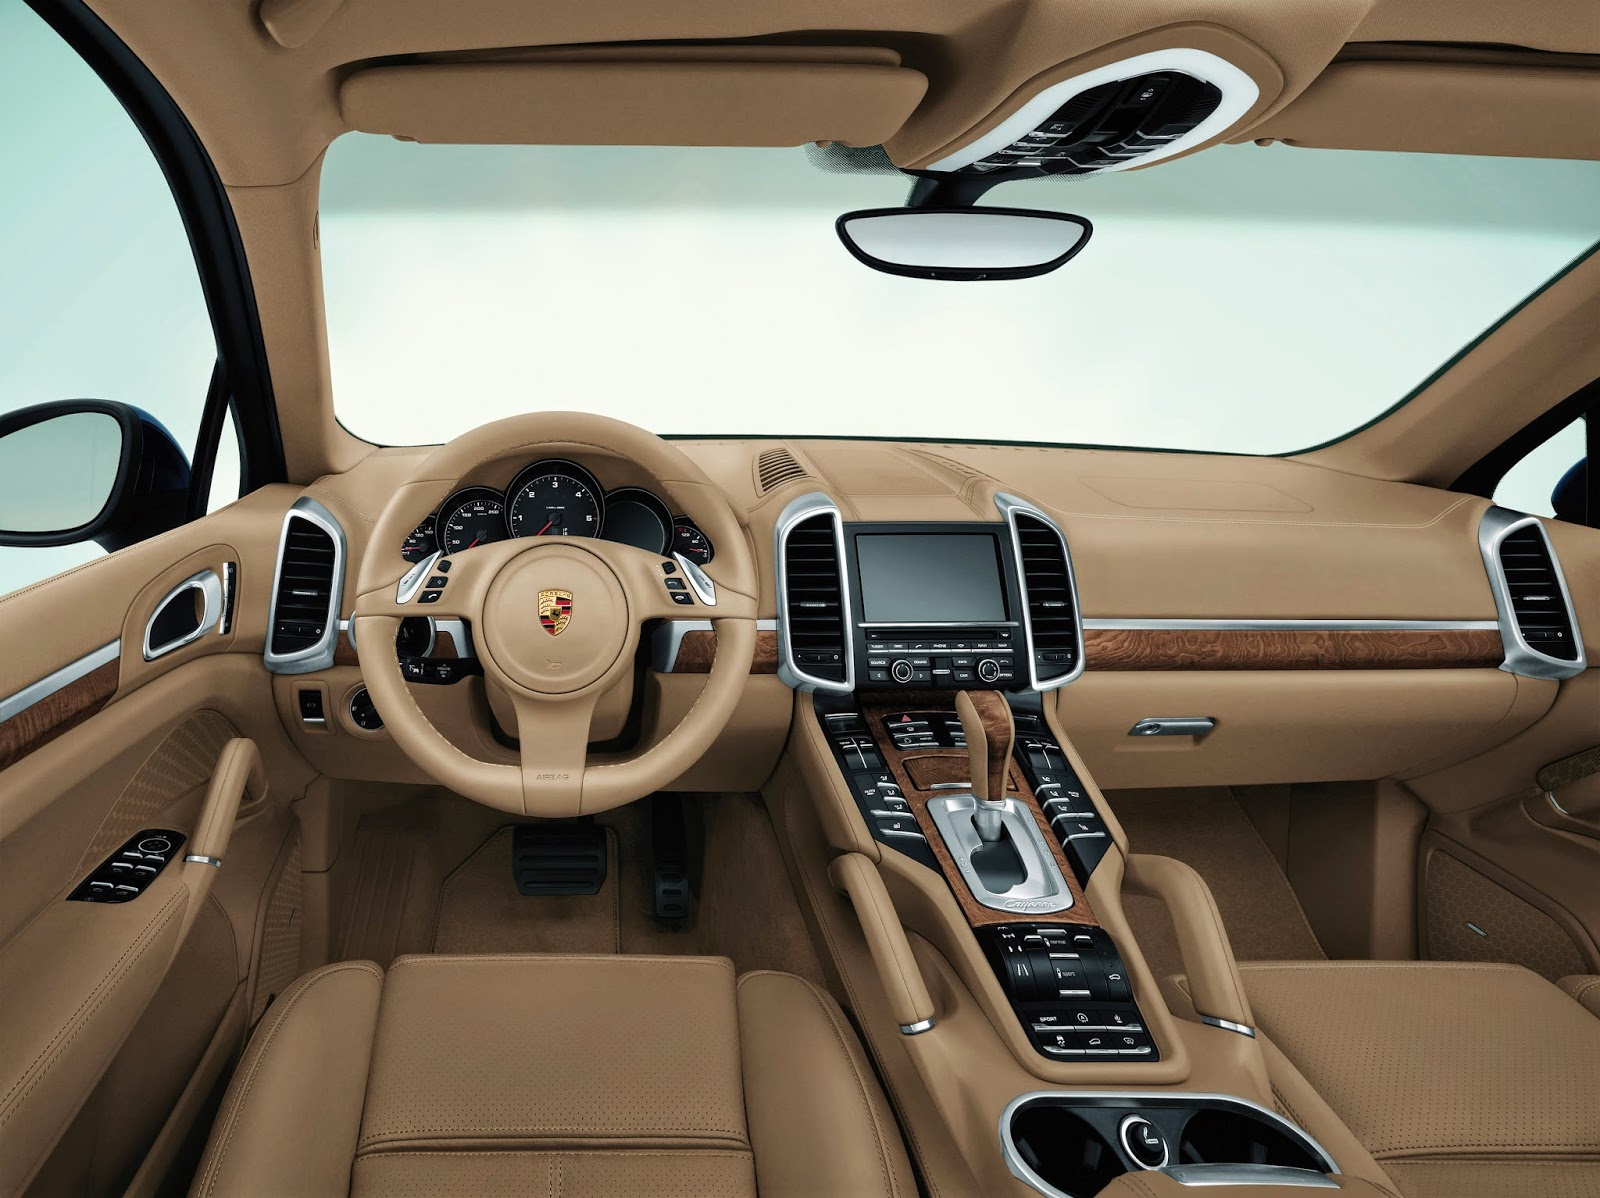 Porche Cayenne S Hybrid E: